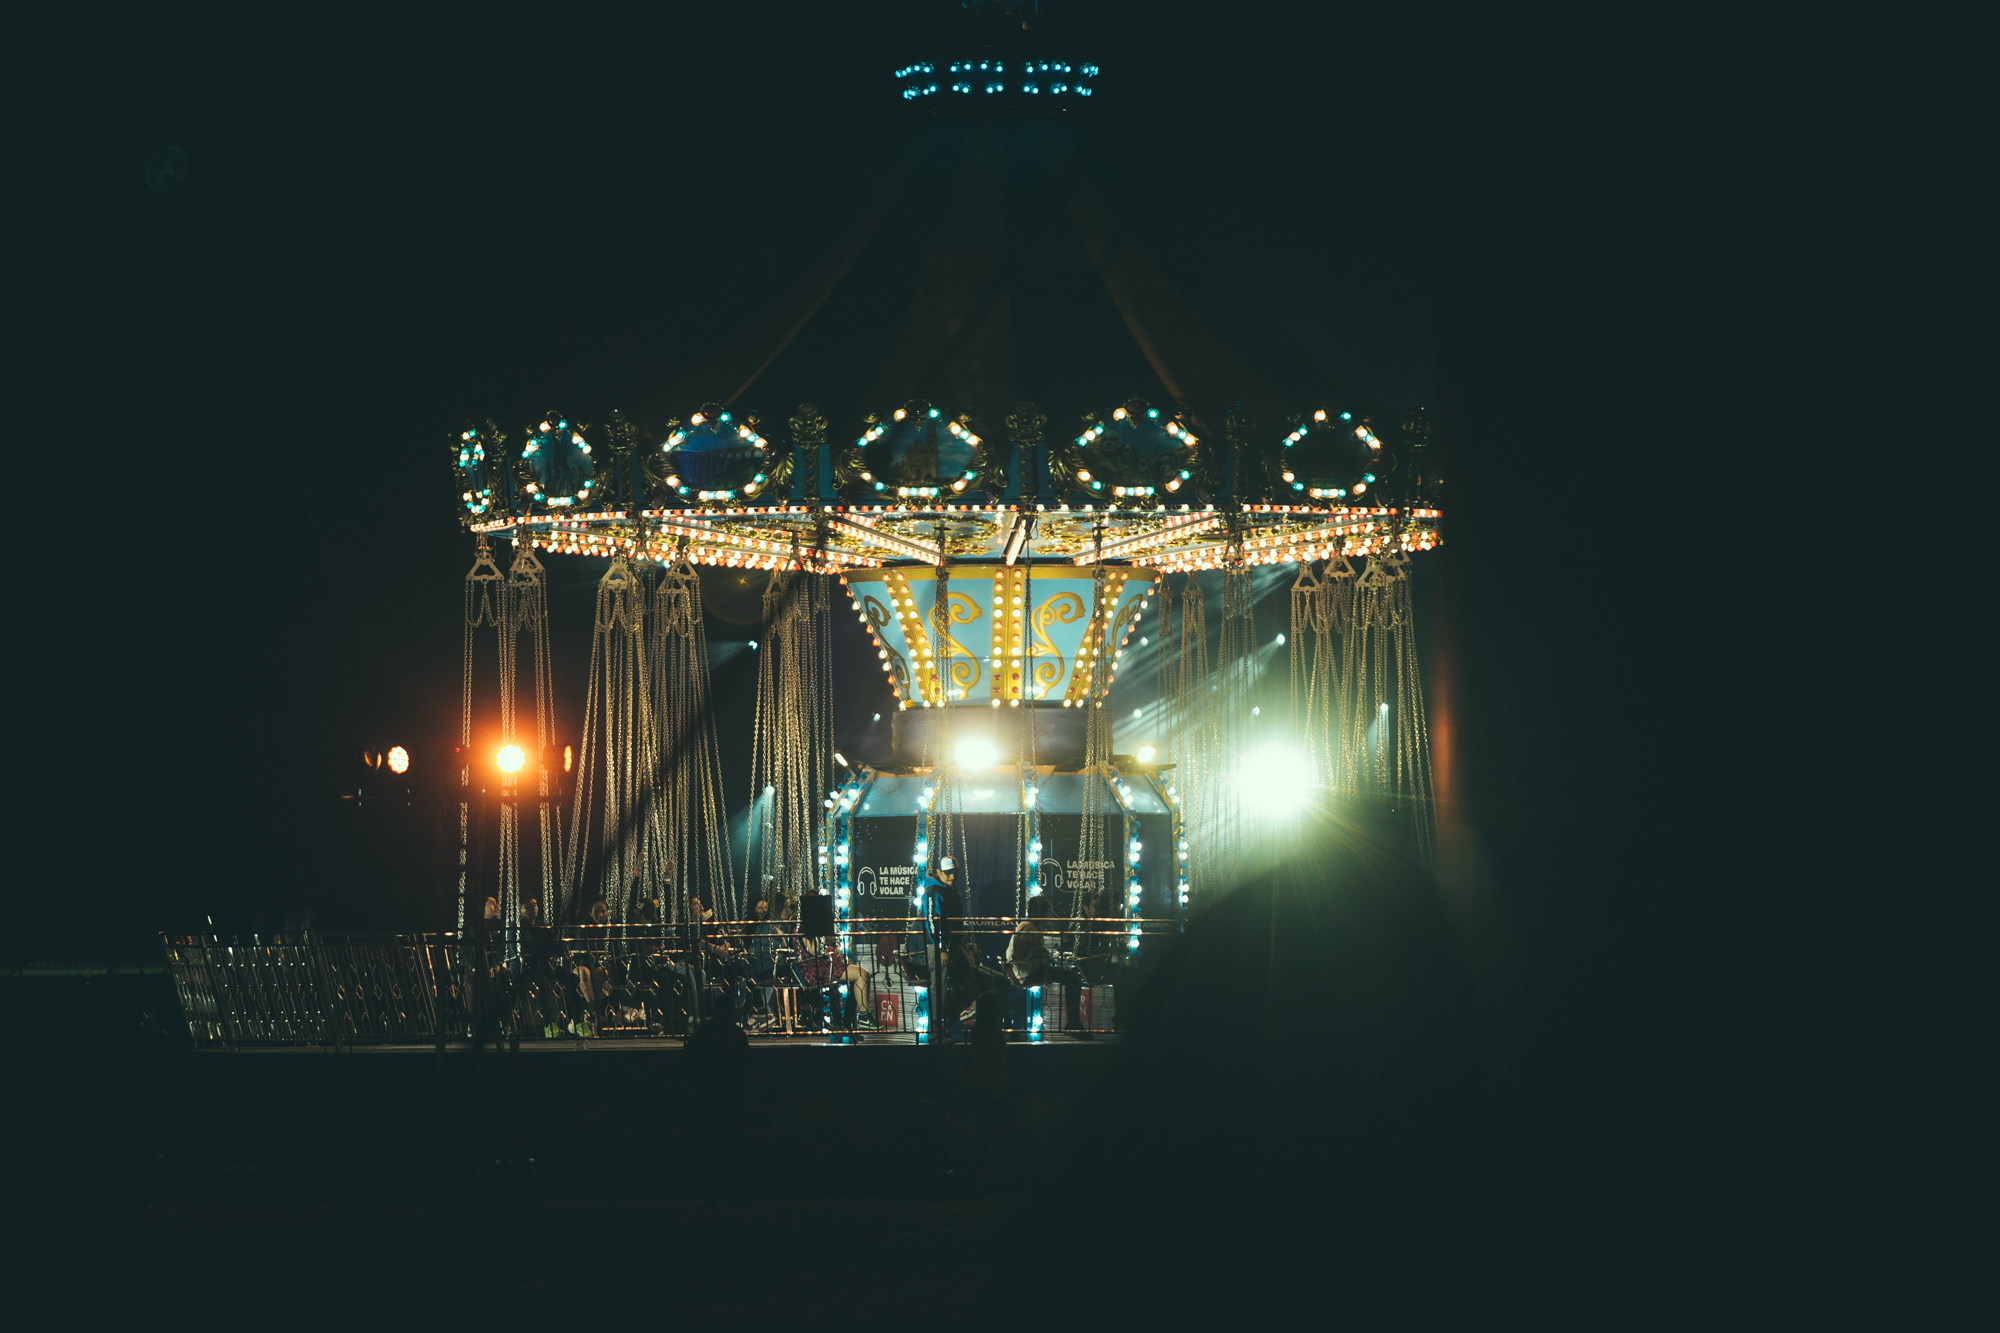 Crowd-Festival Ceremonia-Mexico-Foro Pegaso-04.02.2017-Daniel Patlan_Desde 1989 (47 of 49).jpg